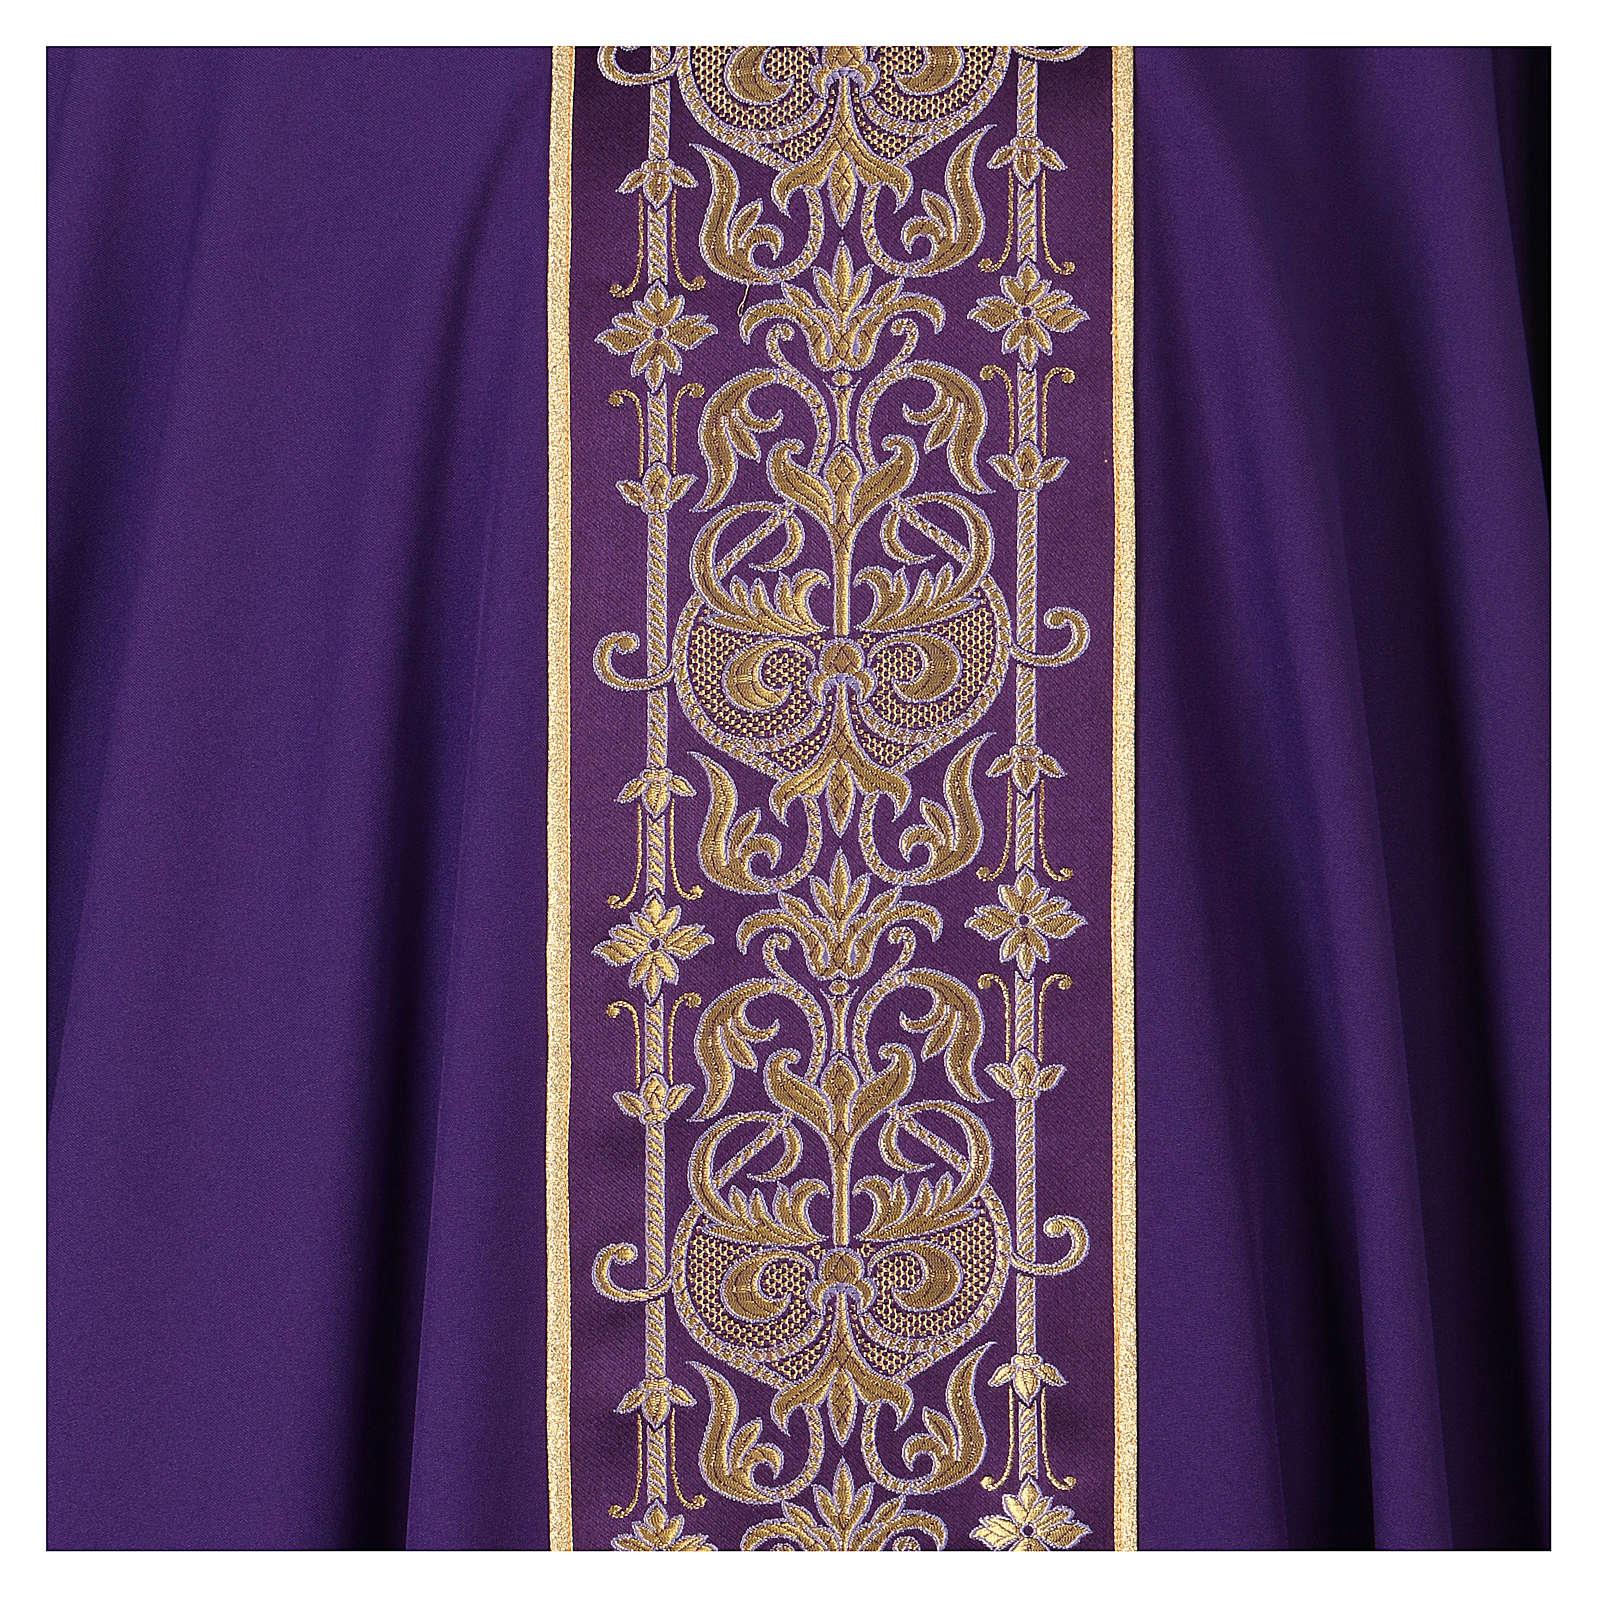 Chasuble bande avant tissu Vatican 100% polyester 4